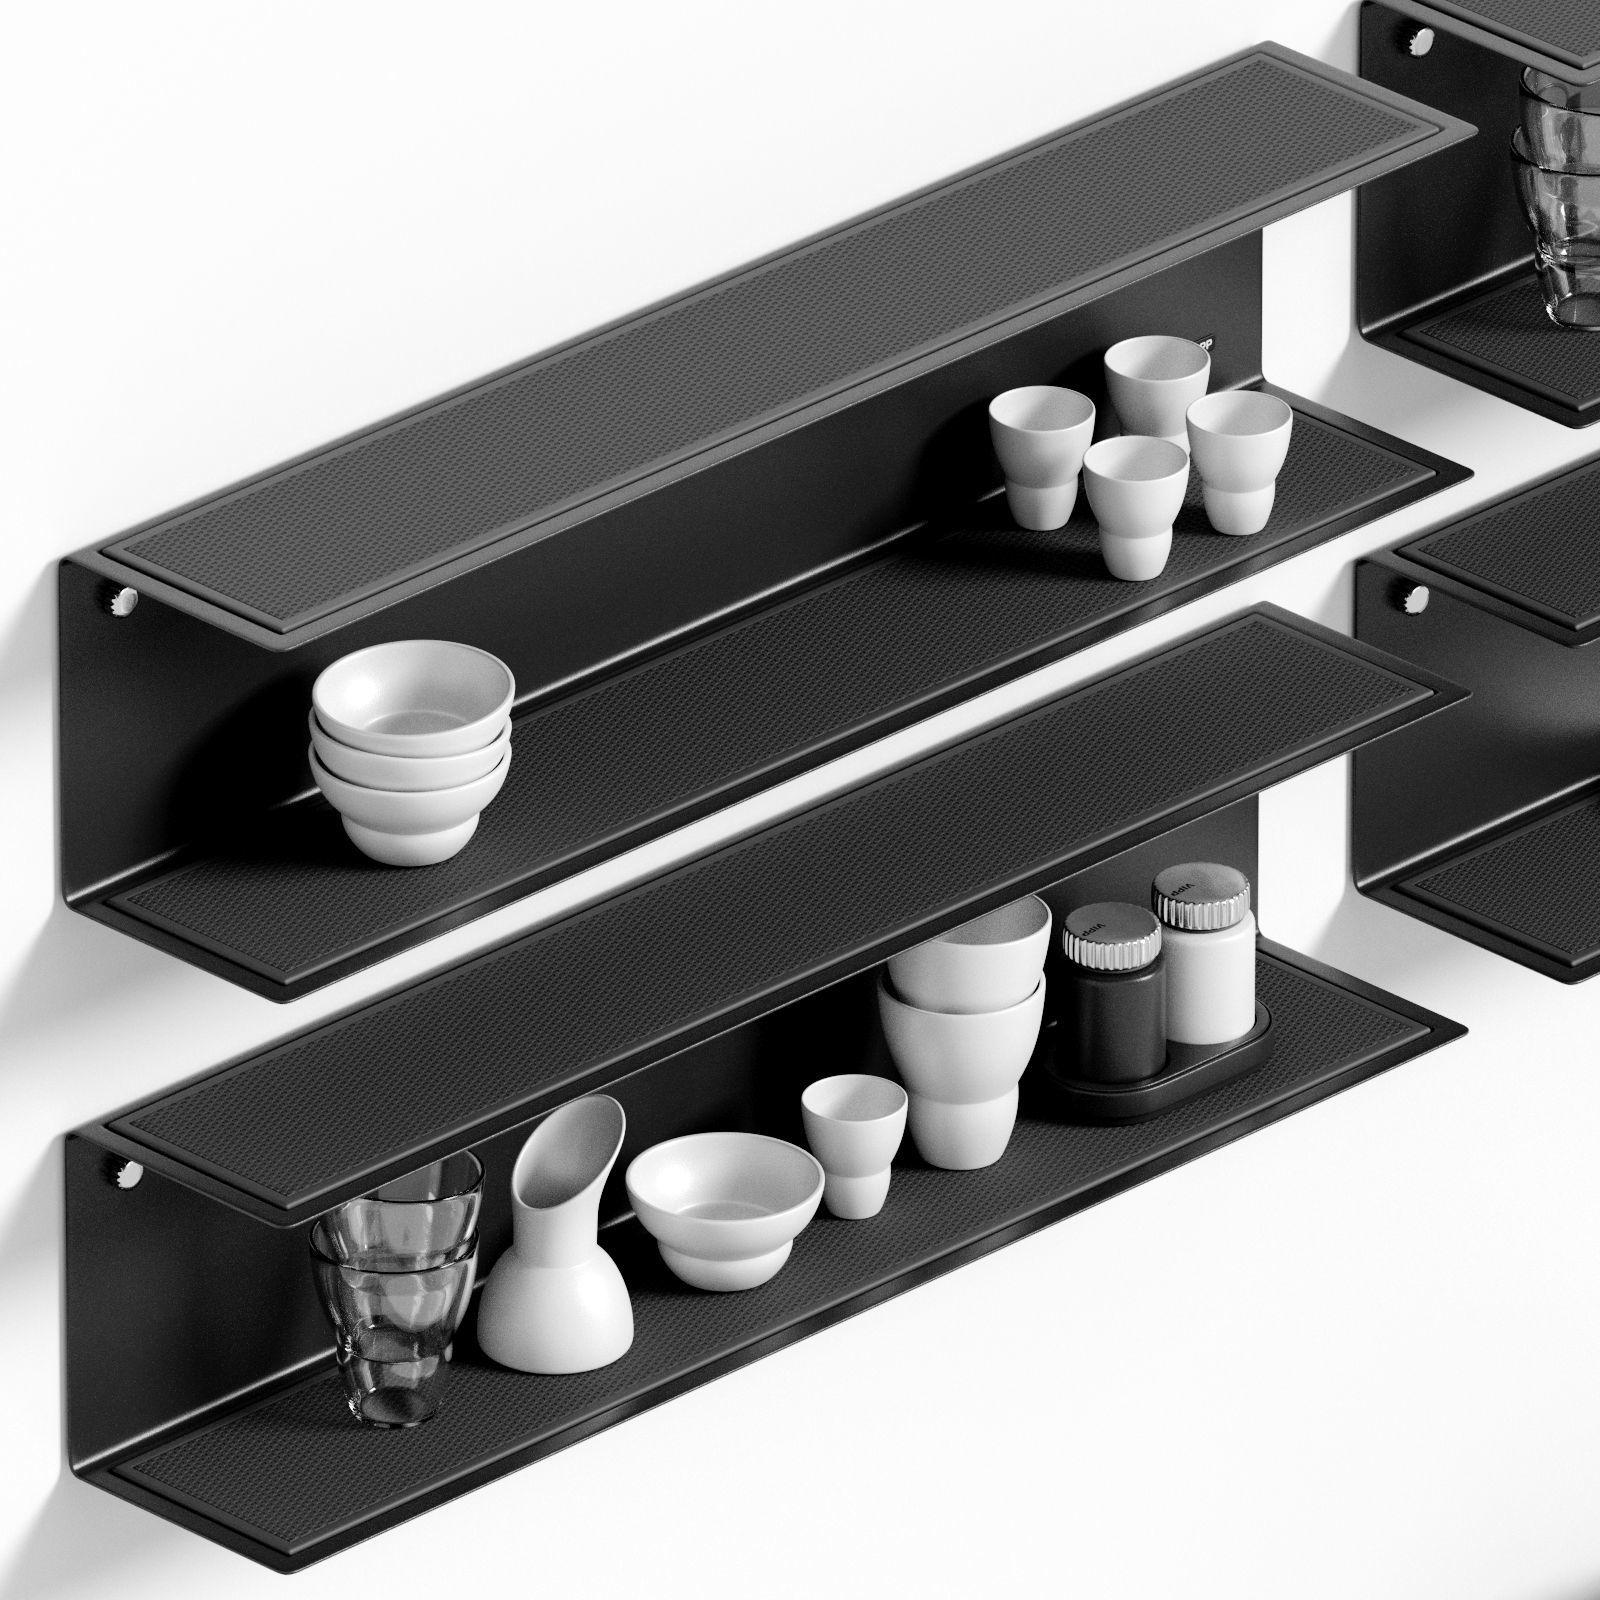 Vipp Shelves and original accessories